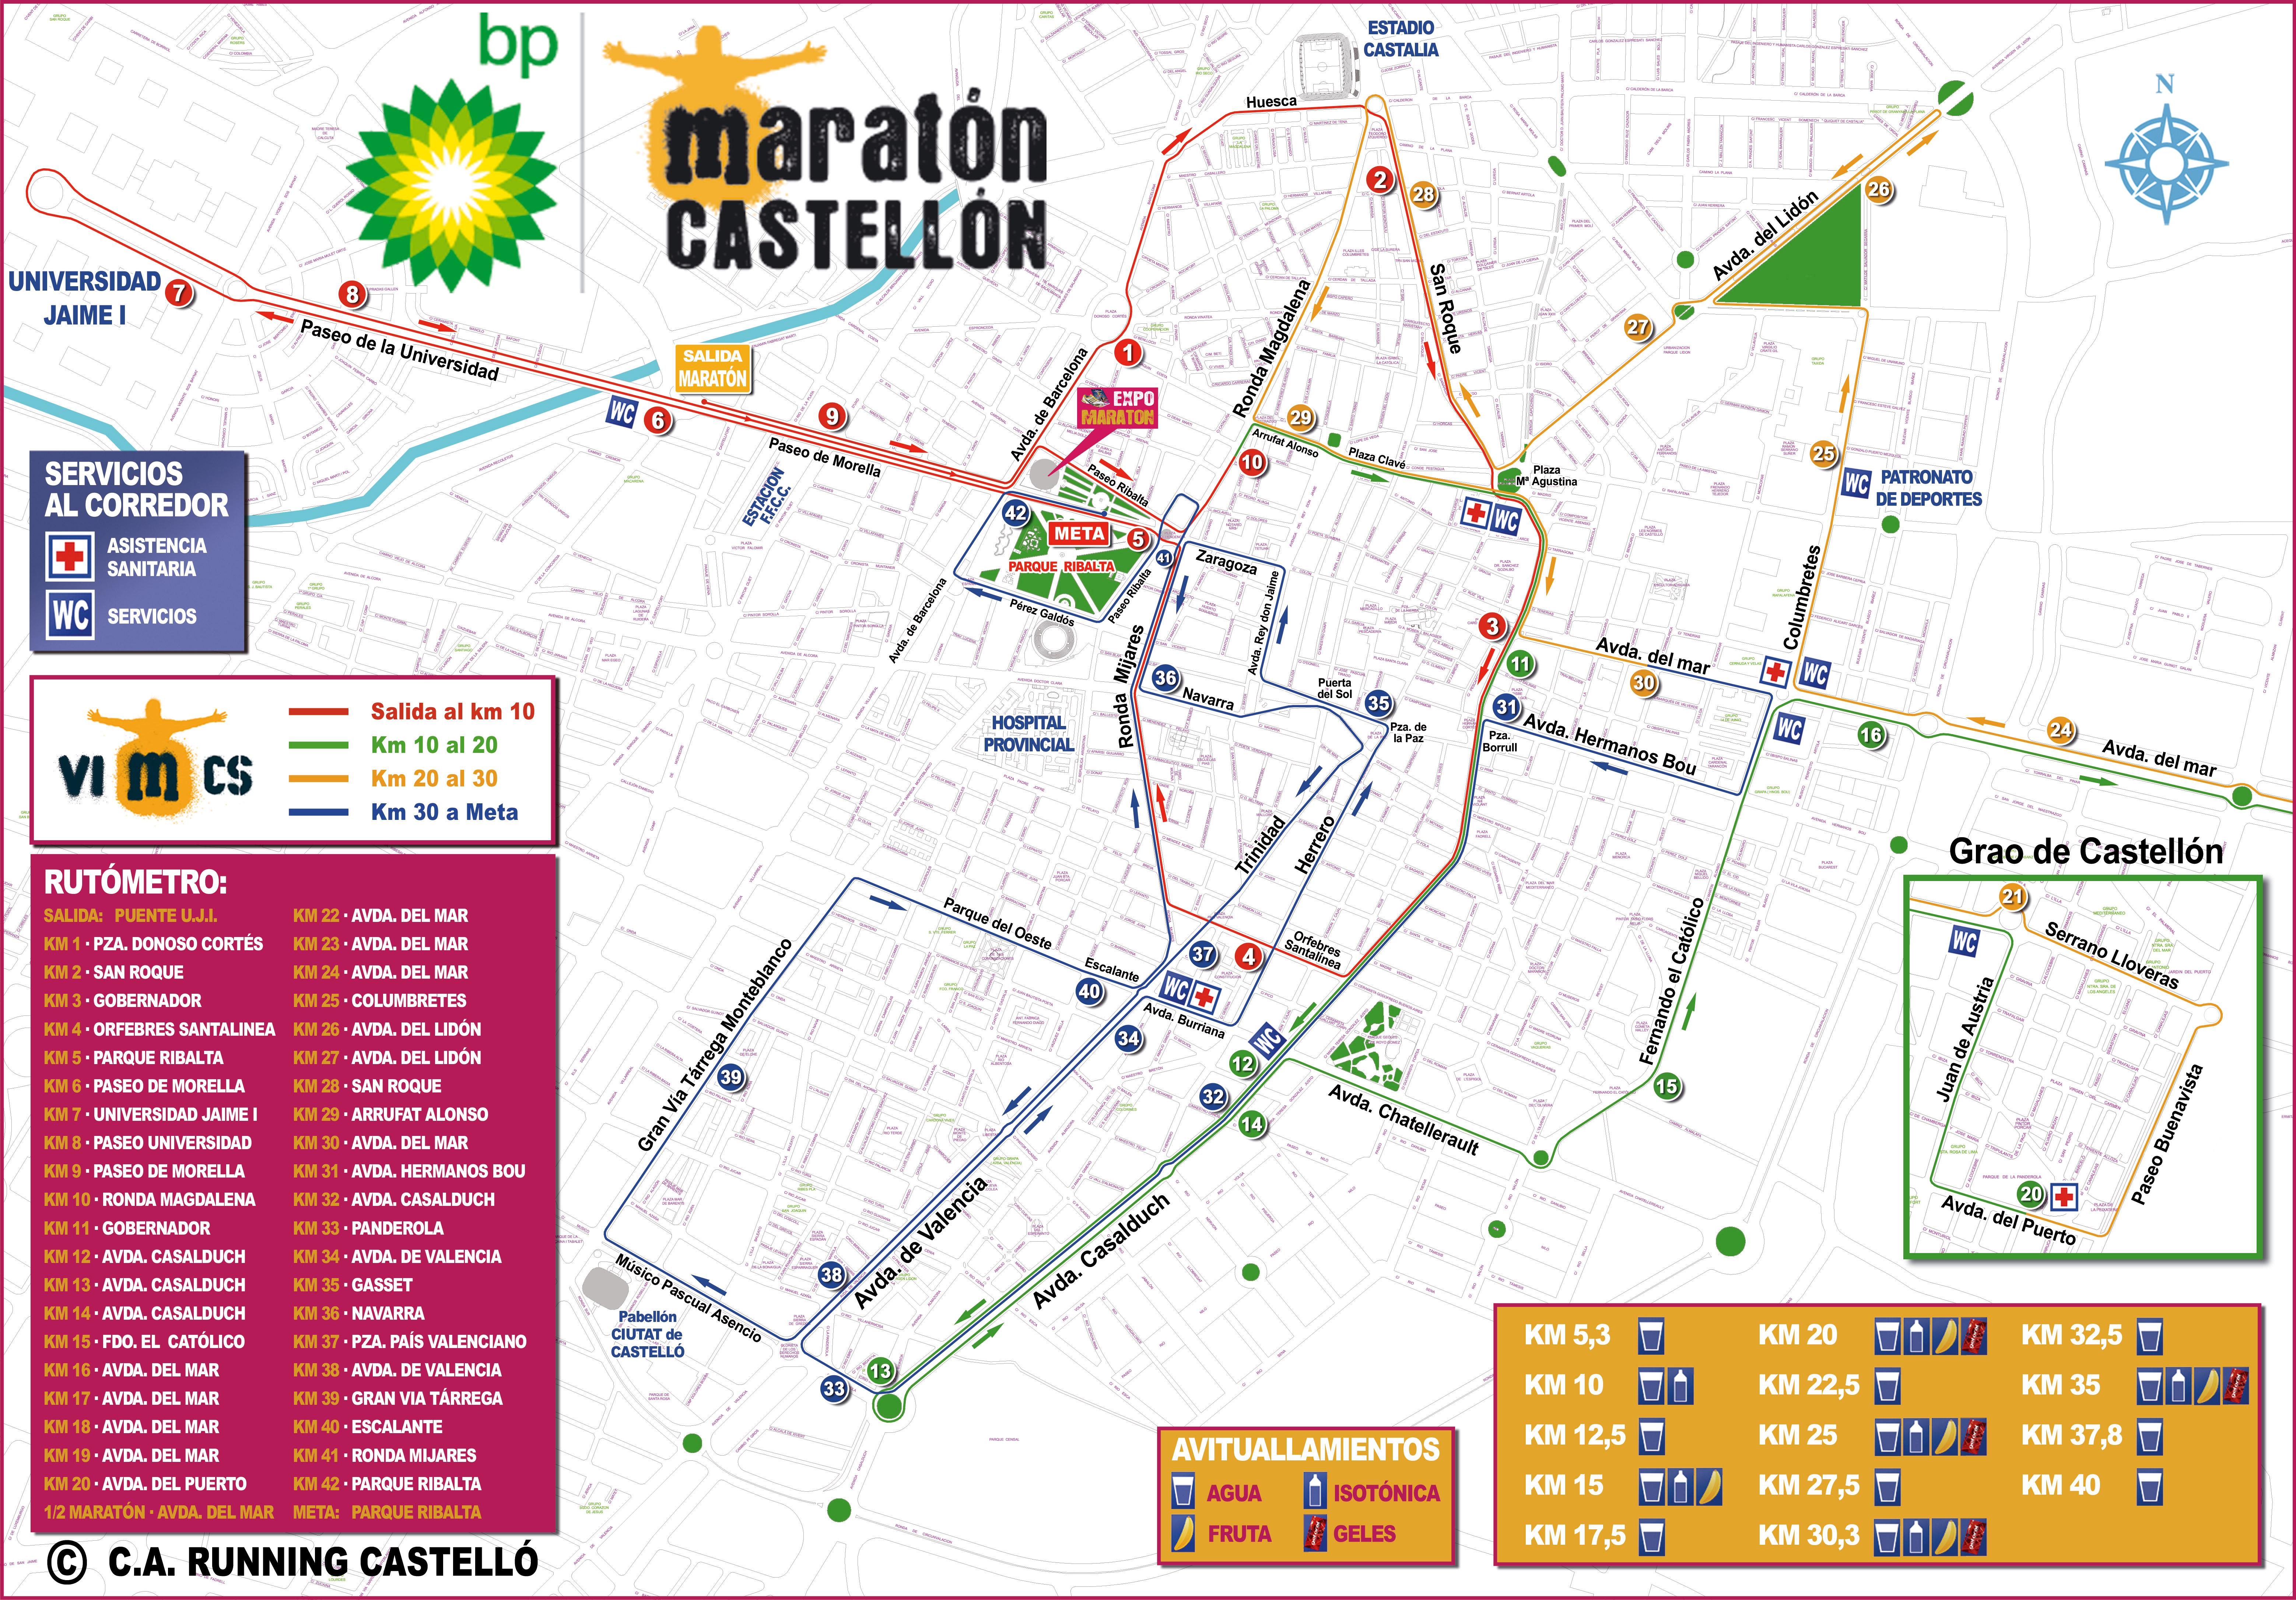 MARATON-2015-BP